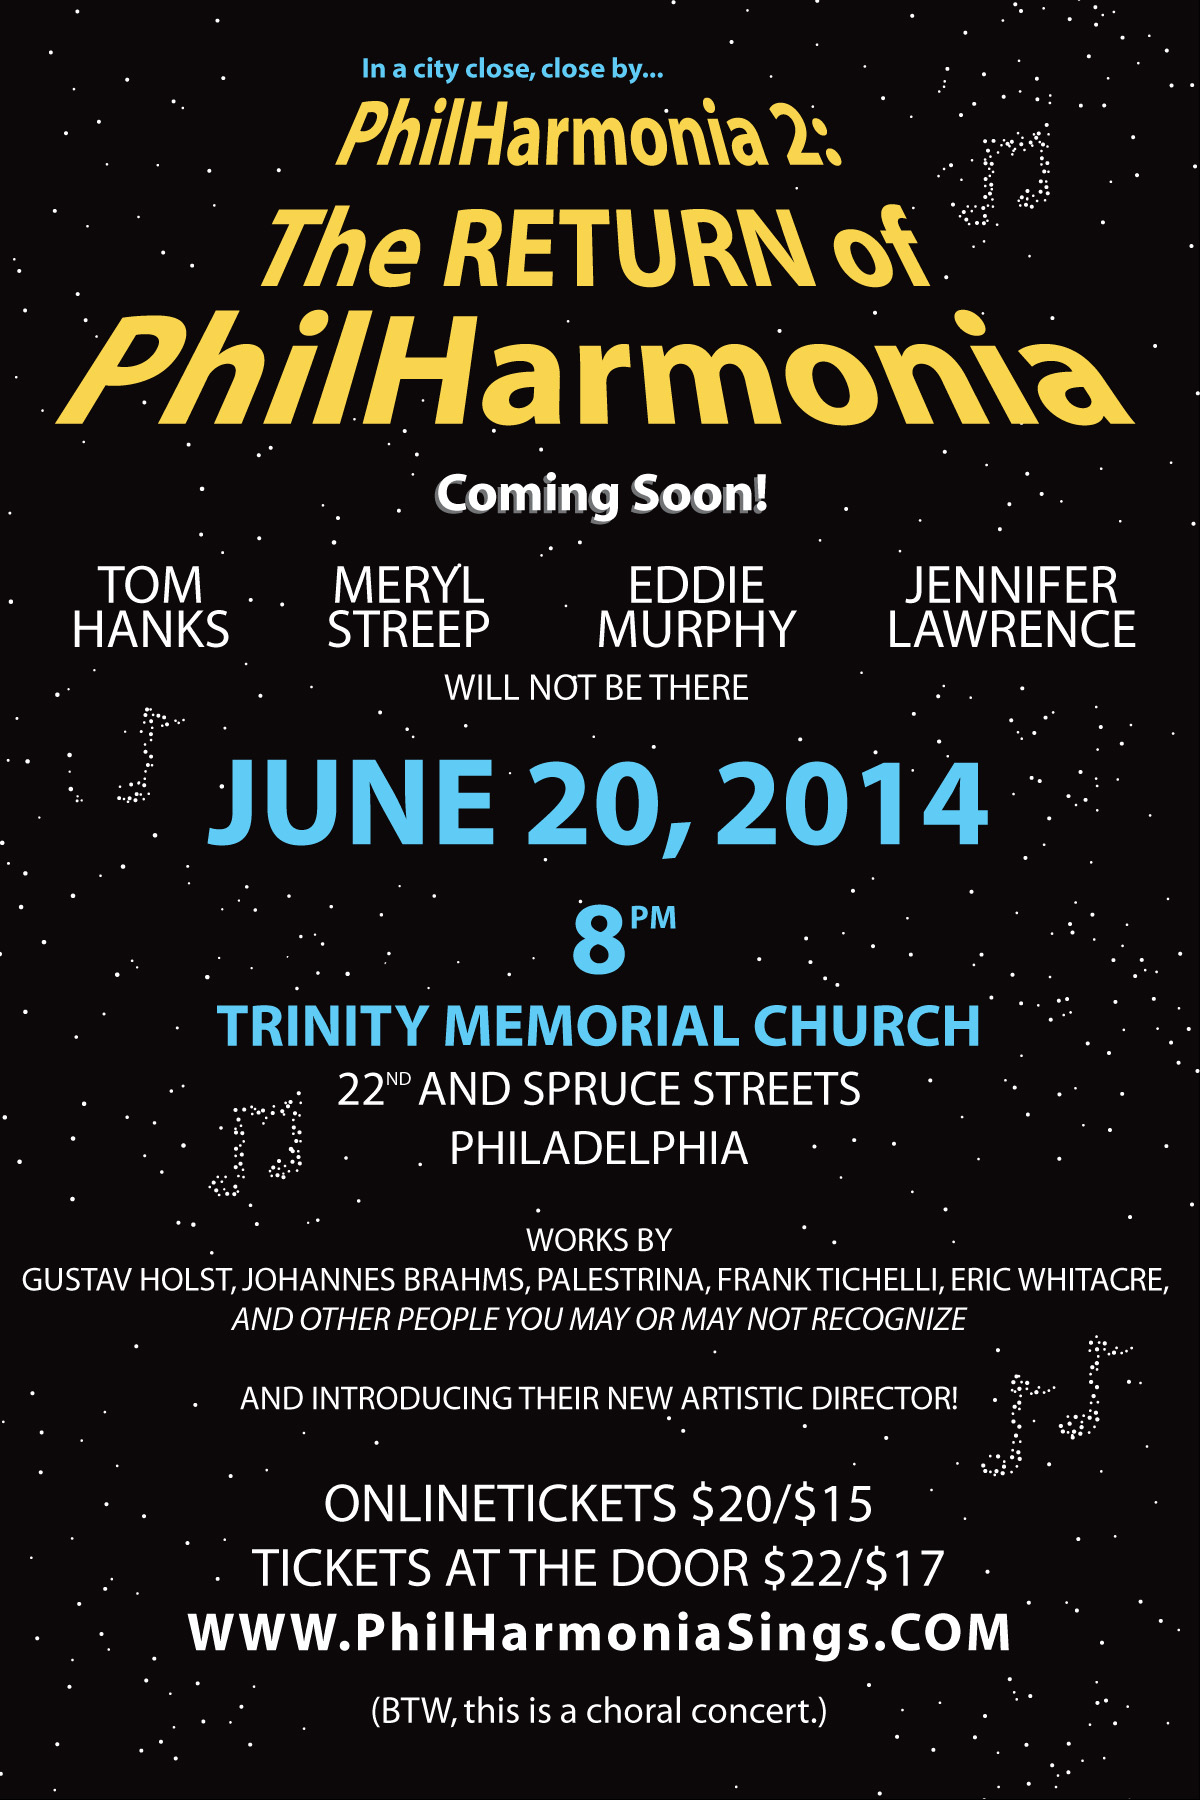 PhilHarmonia_postcard.jpg